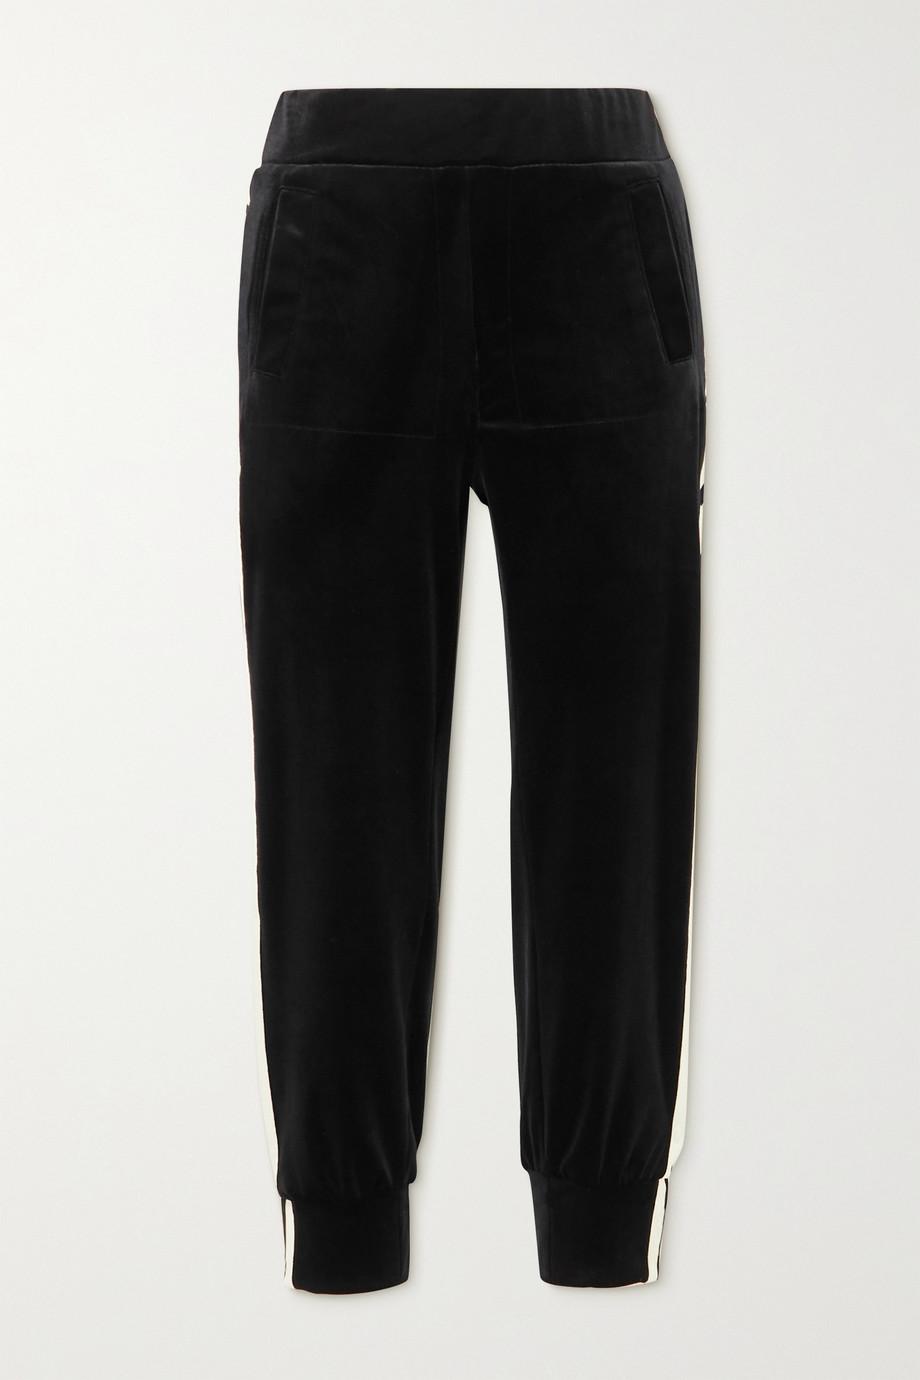 Norma Kamali Striped webbing-trimmed stretch-velvet track pants